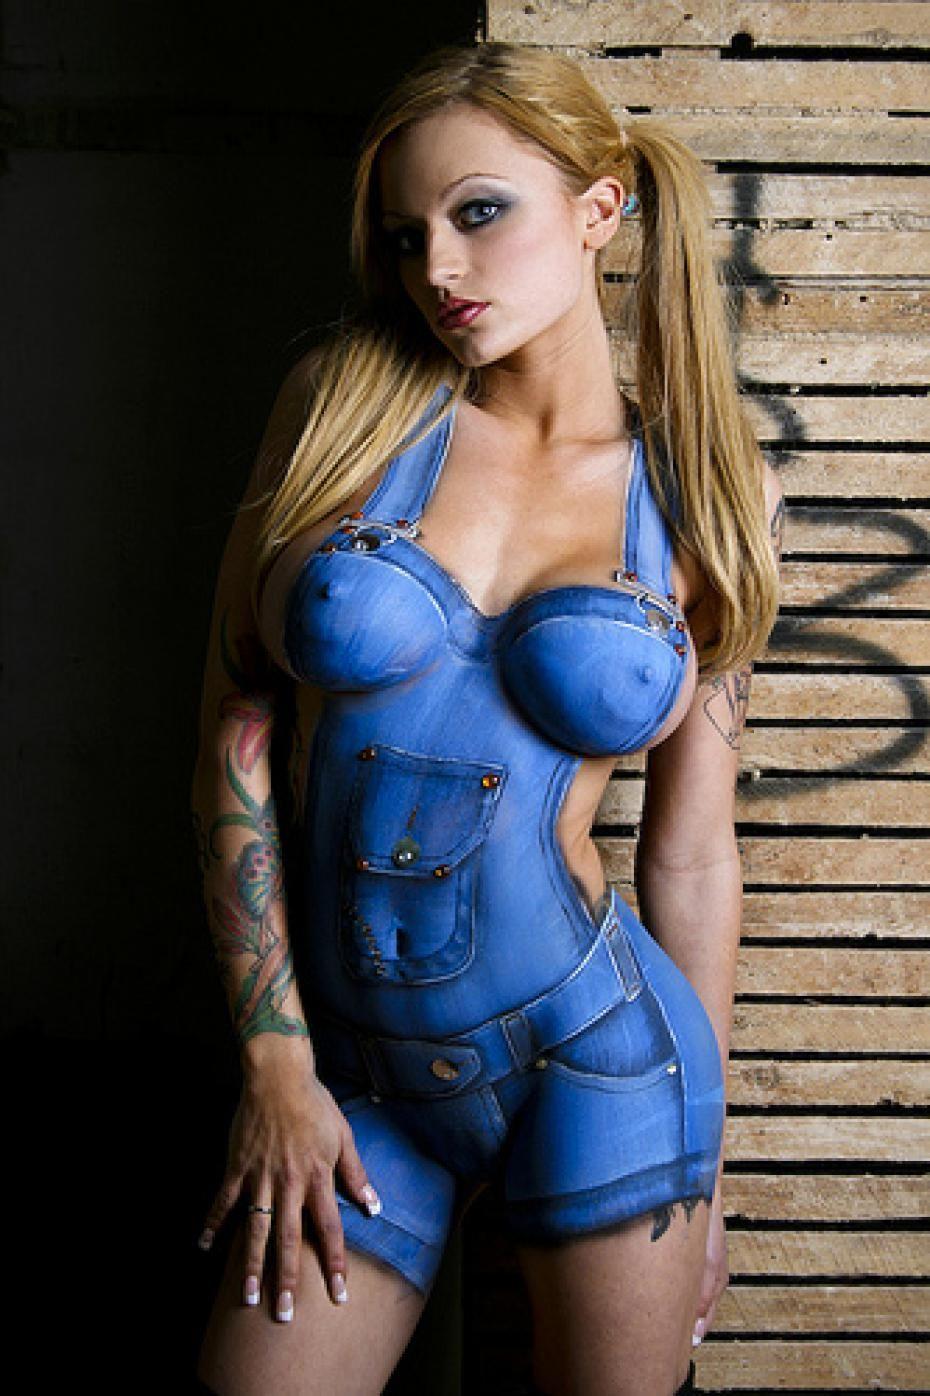 le-body-painting-est-souvent-sexy (930×1396) | girls | pinterest